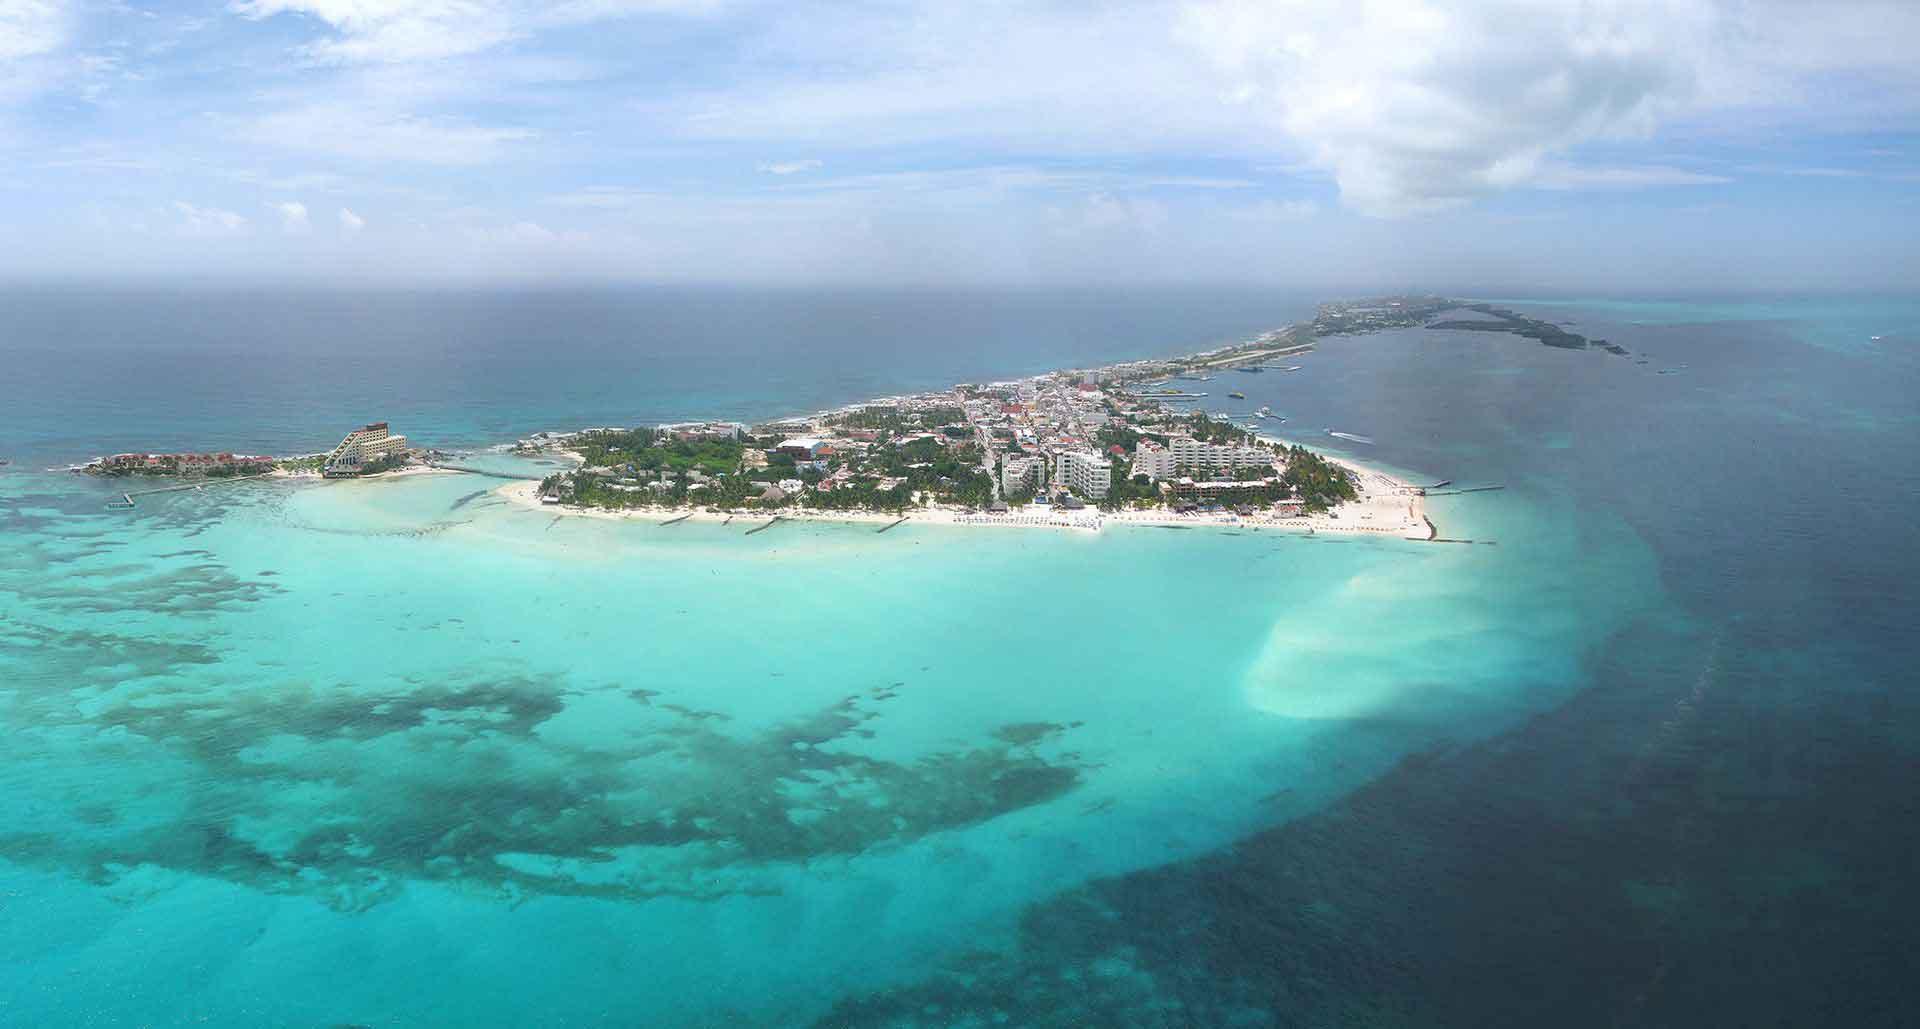 excursion-isla-mujeres-riviera-maya-sl-4-o